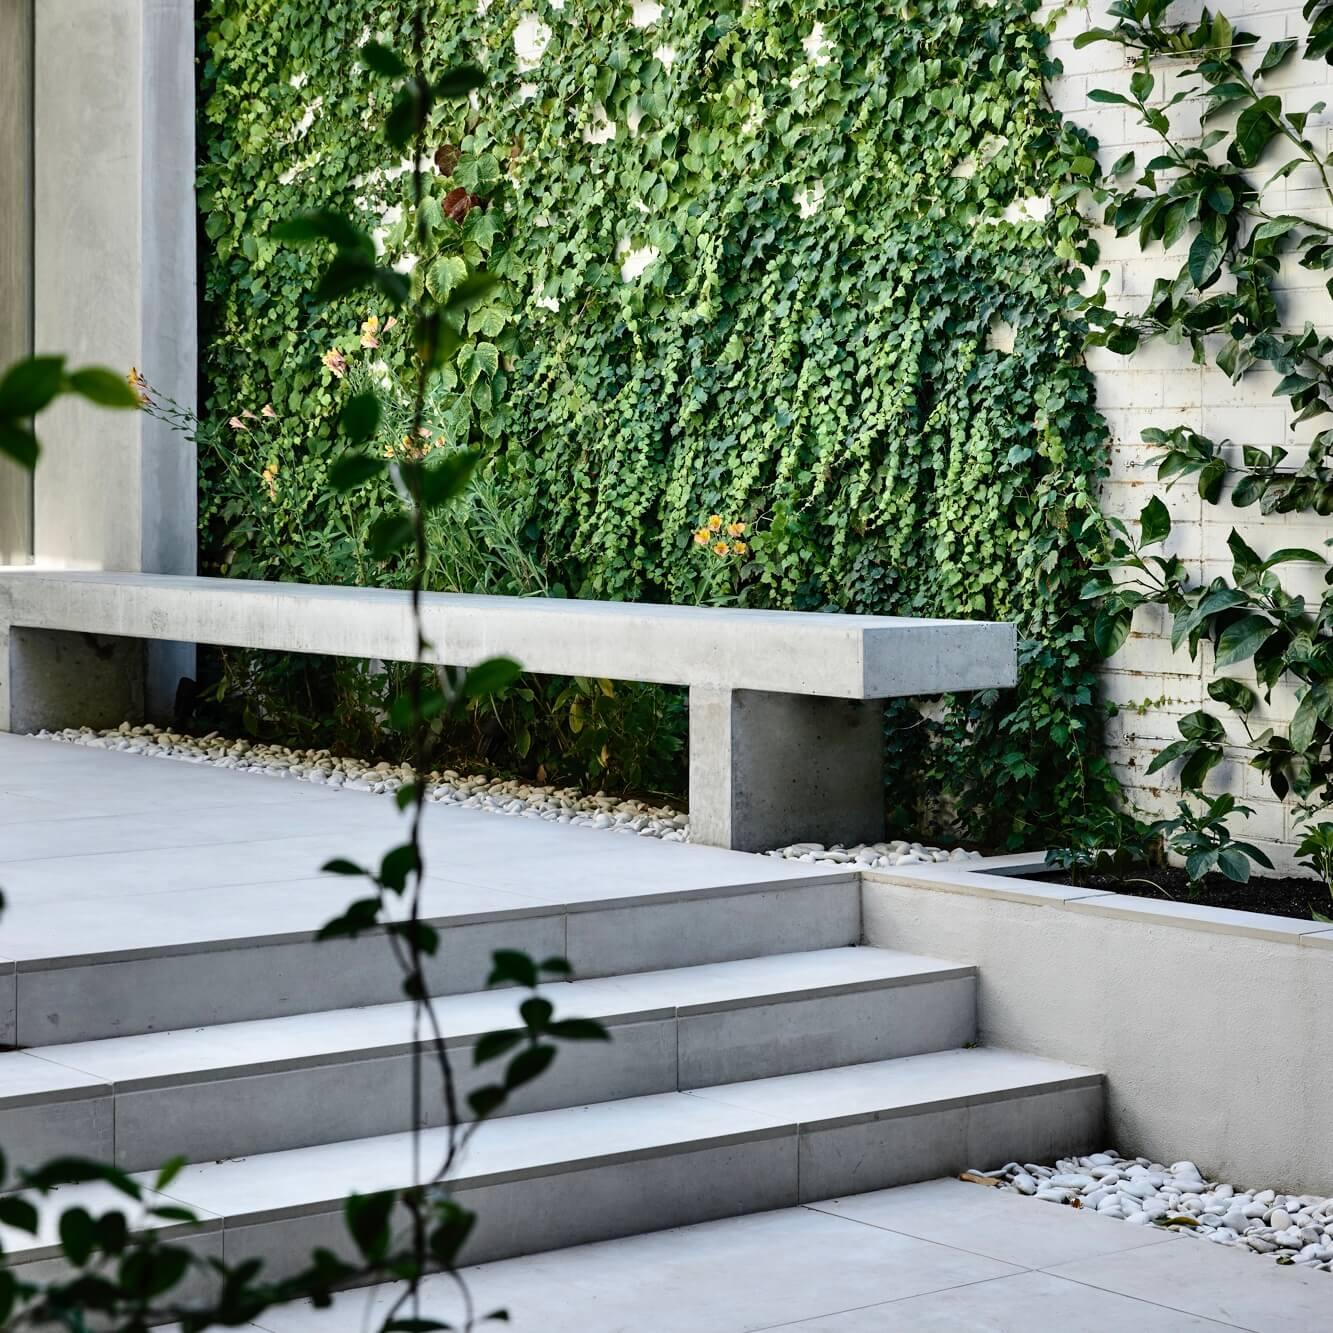 Image 13_Nadia Gill Landscape Architect_Derek Swalwell